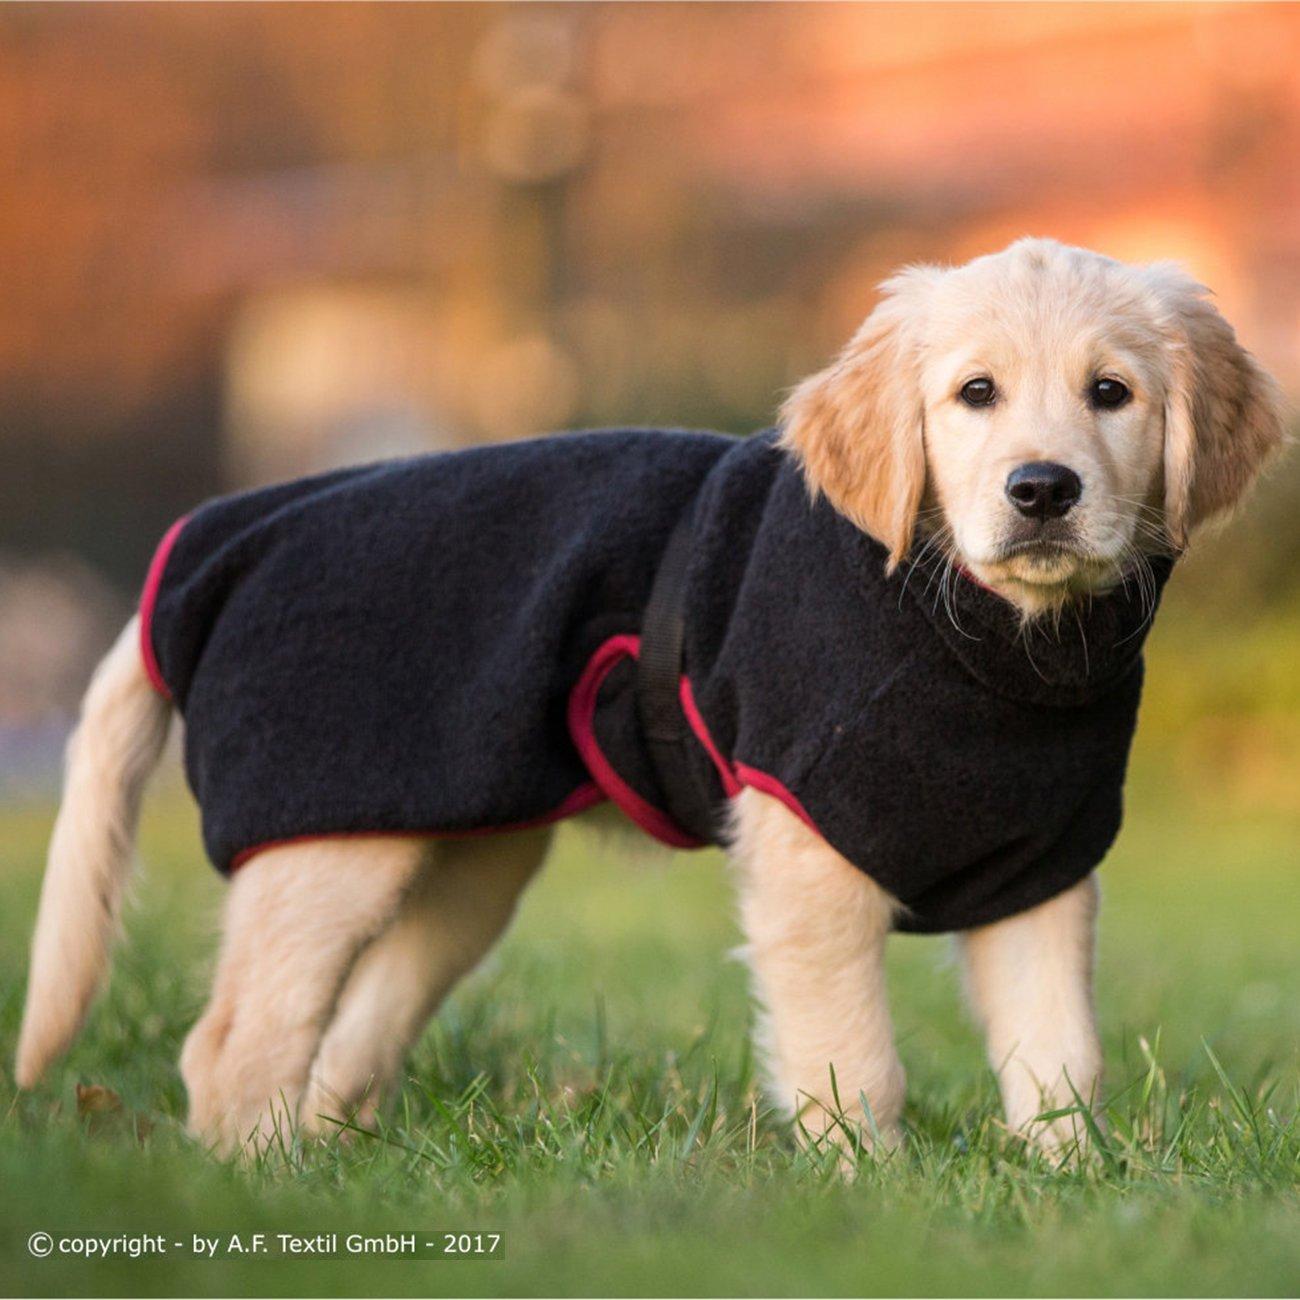 ActionFactory fit4dogs Dryup Mini Trockenmantel für Hunde, Bild 8